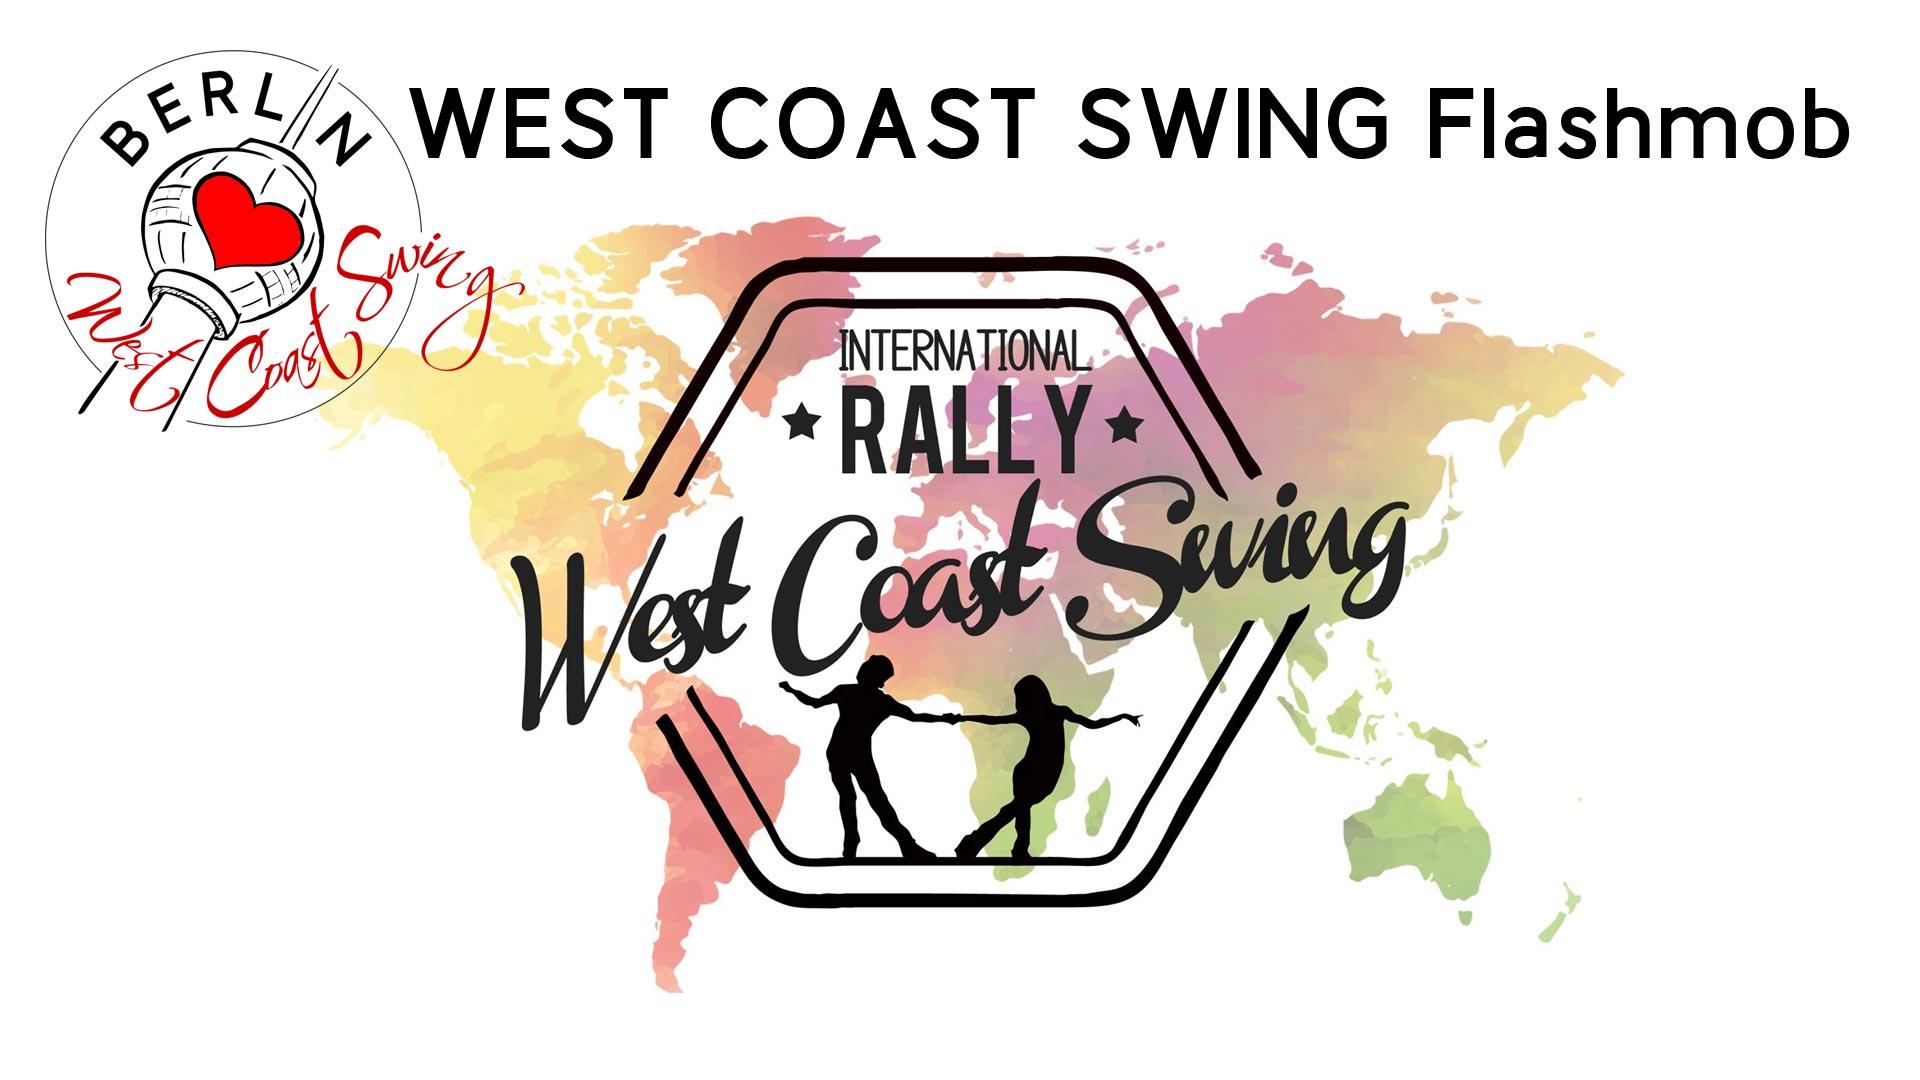 International West Coast Swing Flashmob 2018